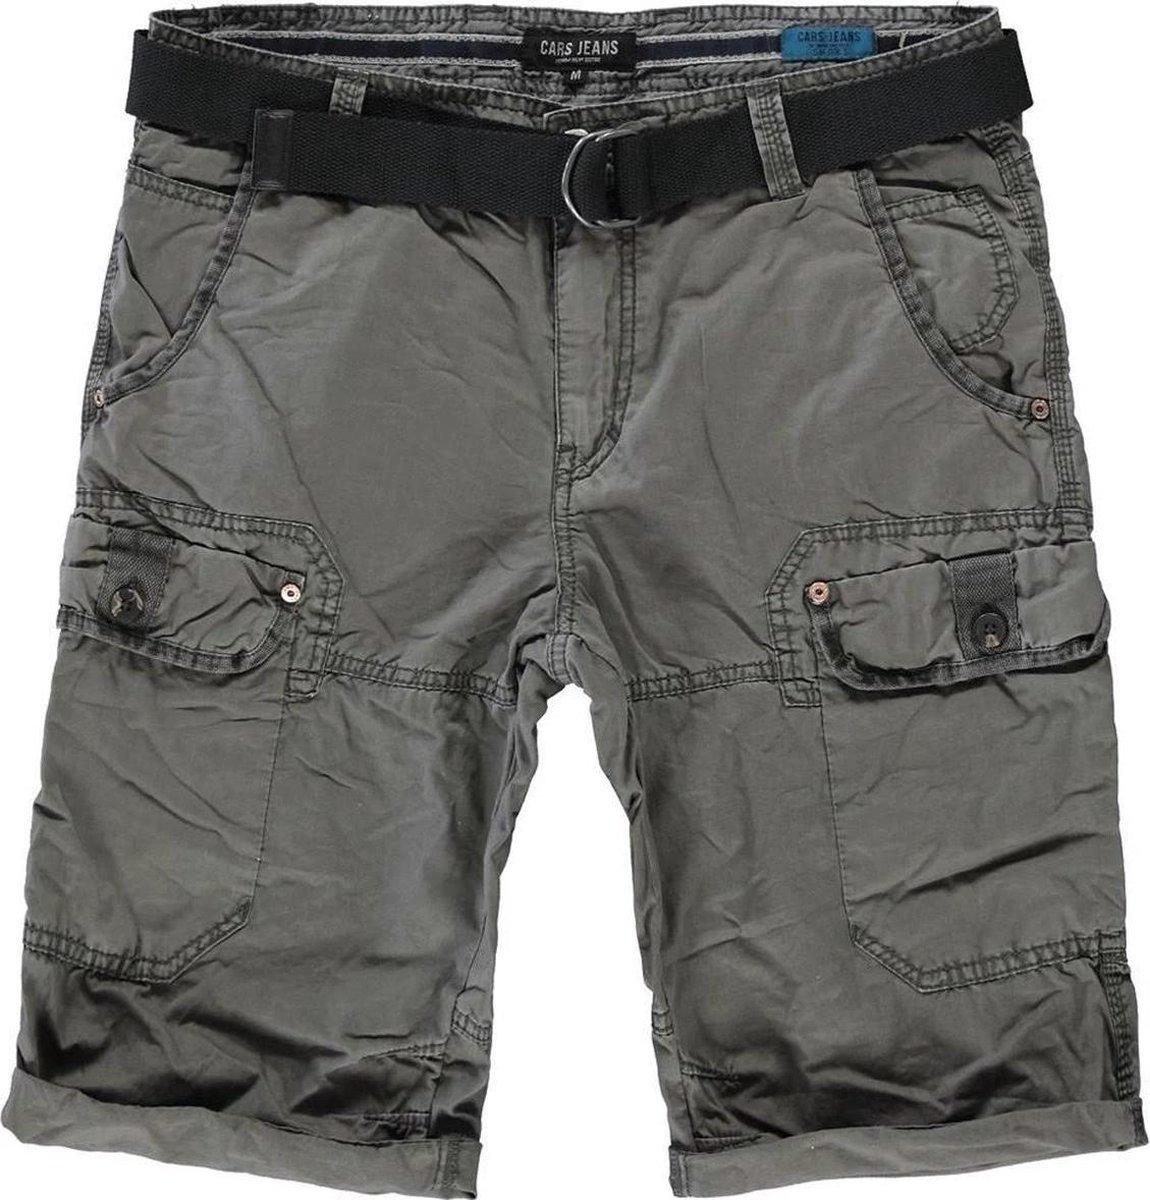 Cars Jeans - RANDOM Short Cotton - Antra - Mannen - Maat XXL